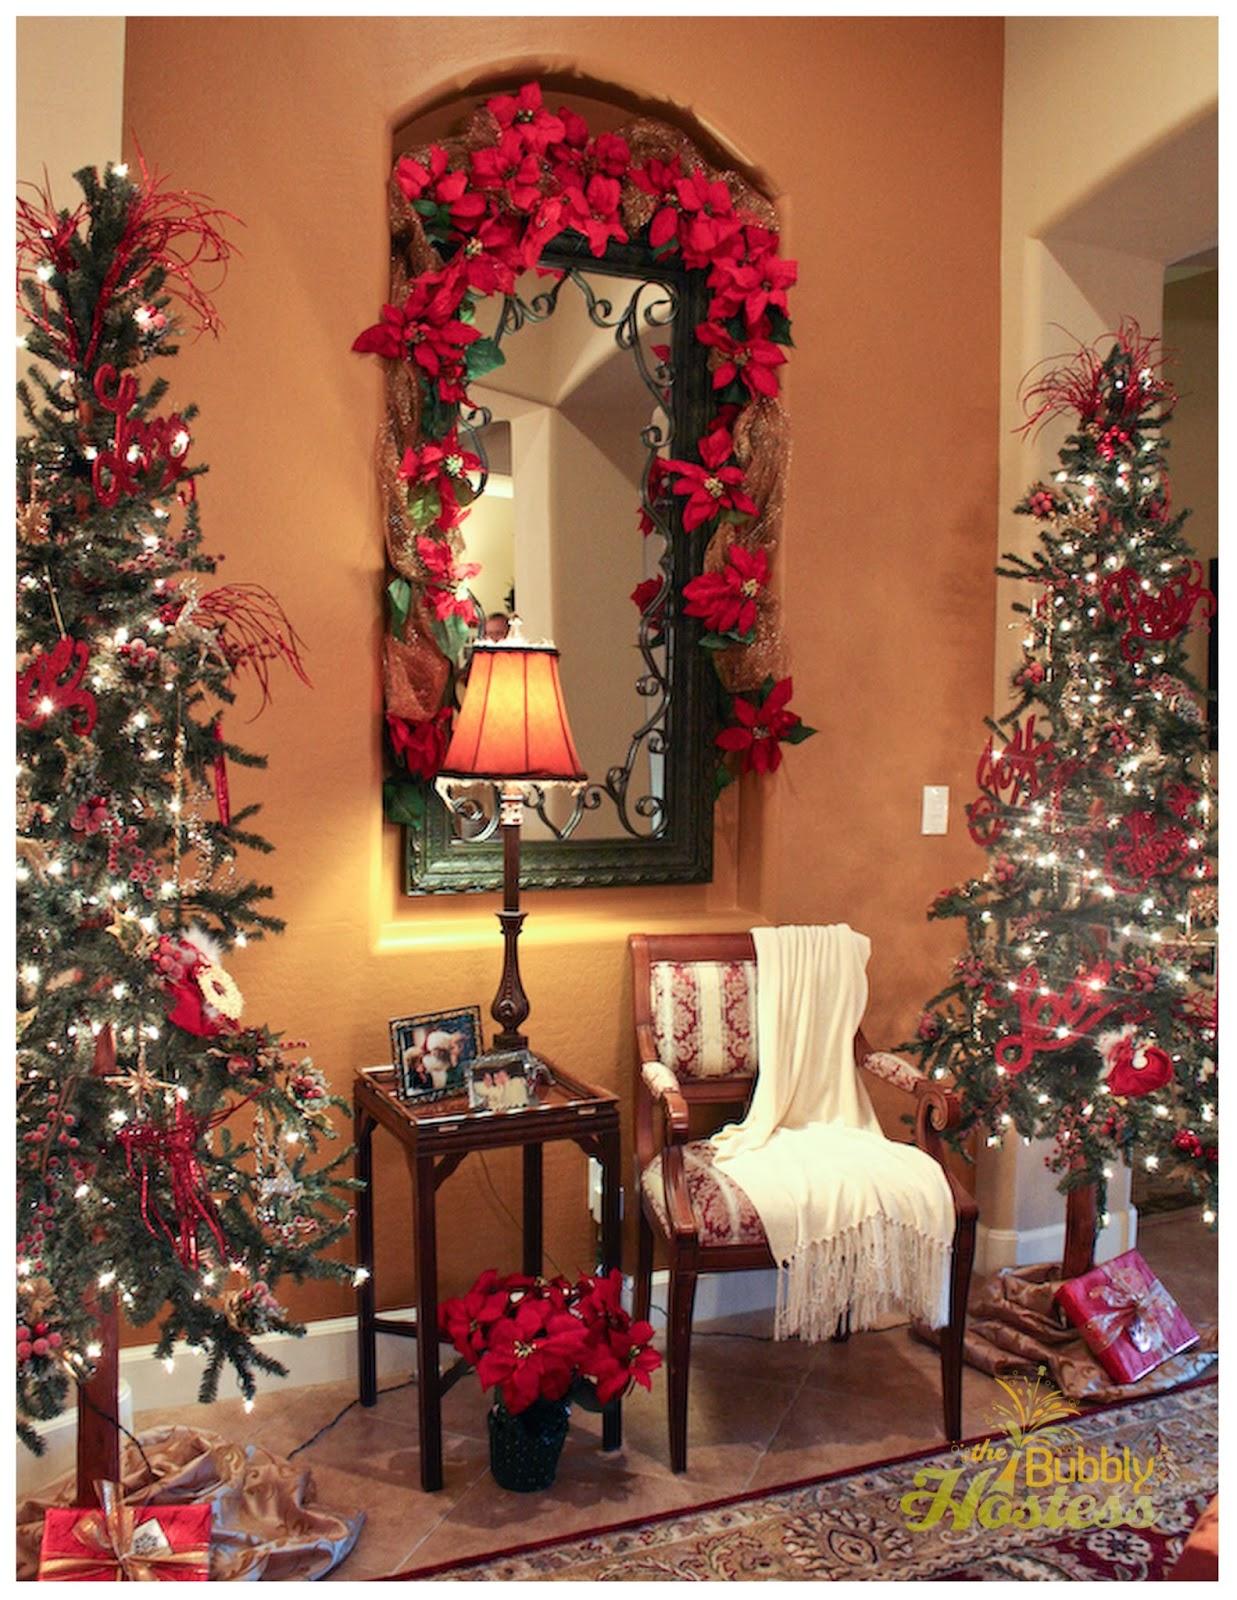 The Bubbly Hostess Foyer Christmas Decorations